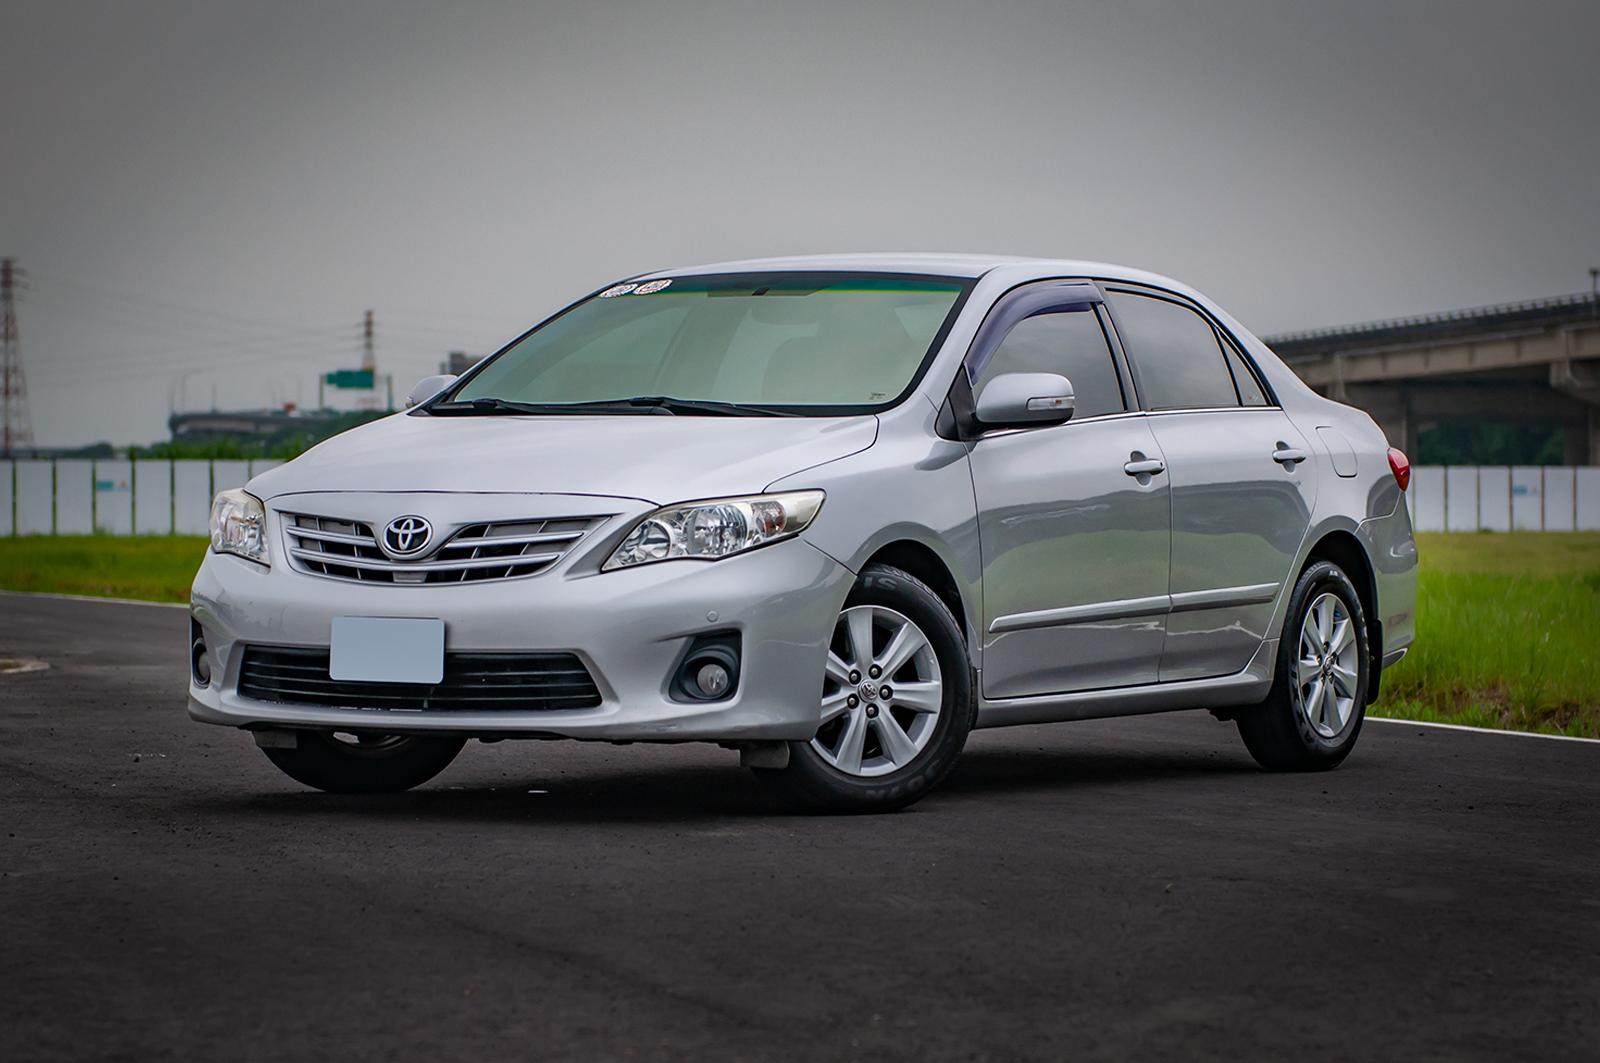 2010 Toyota 豐田 Corolla altis